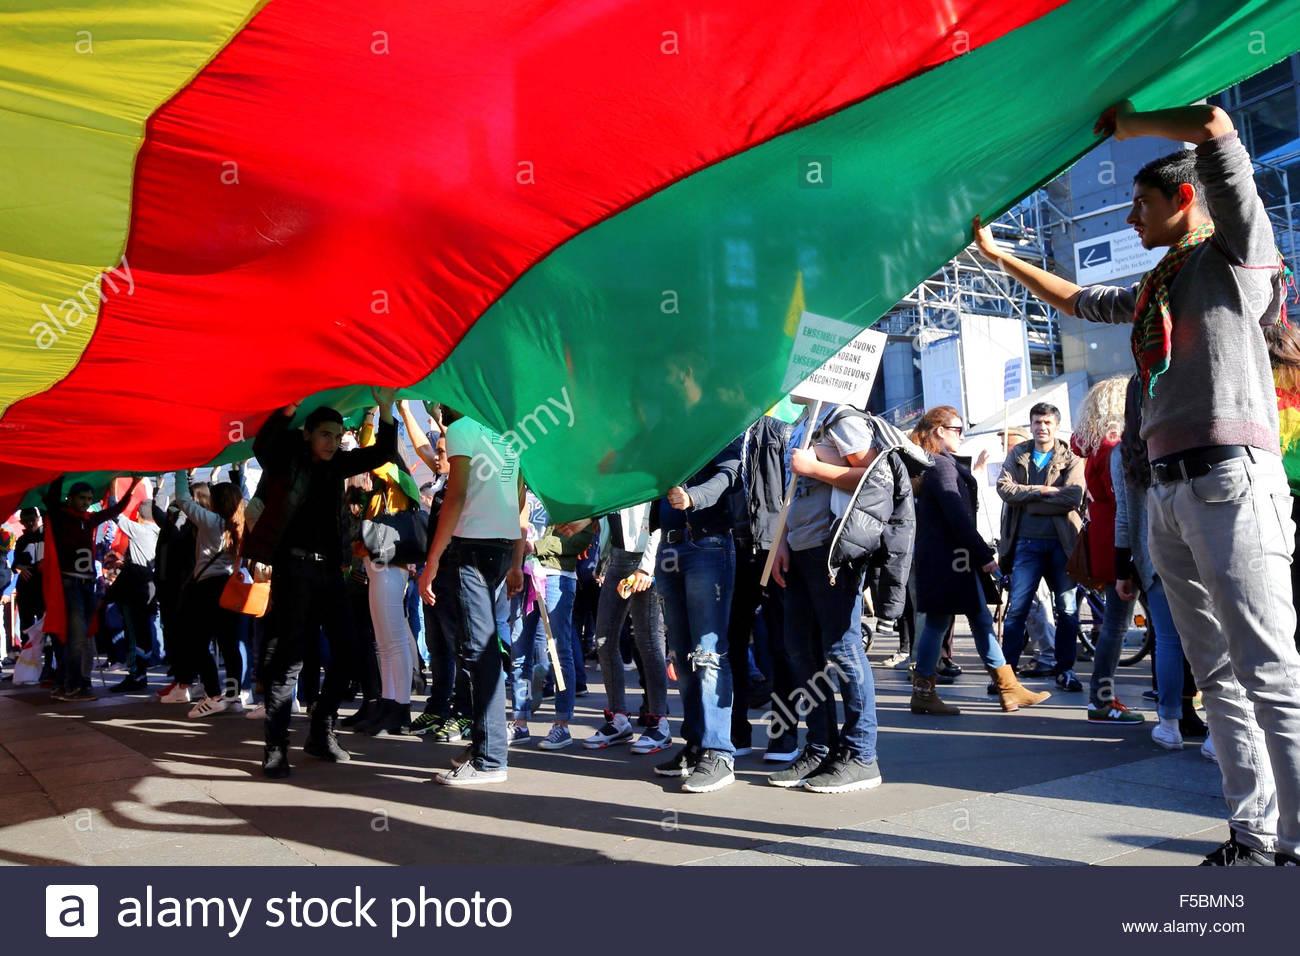 Paris, France. novembre 1st, 2015. FRANCE, Paris: People hold the kurdish flag during a pro kurdish demonstration - Stock Image